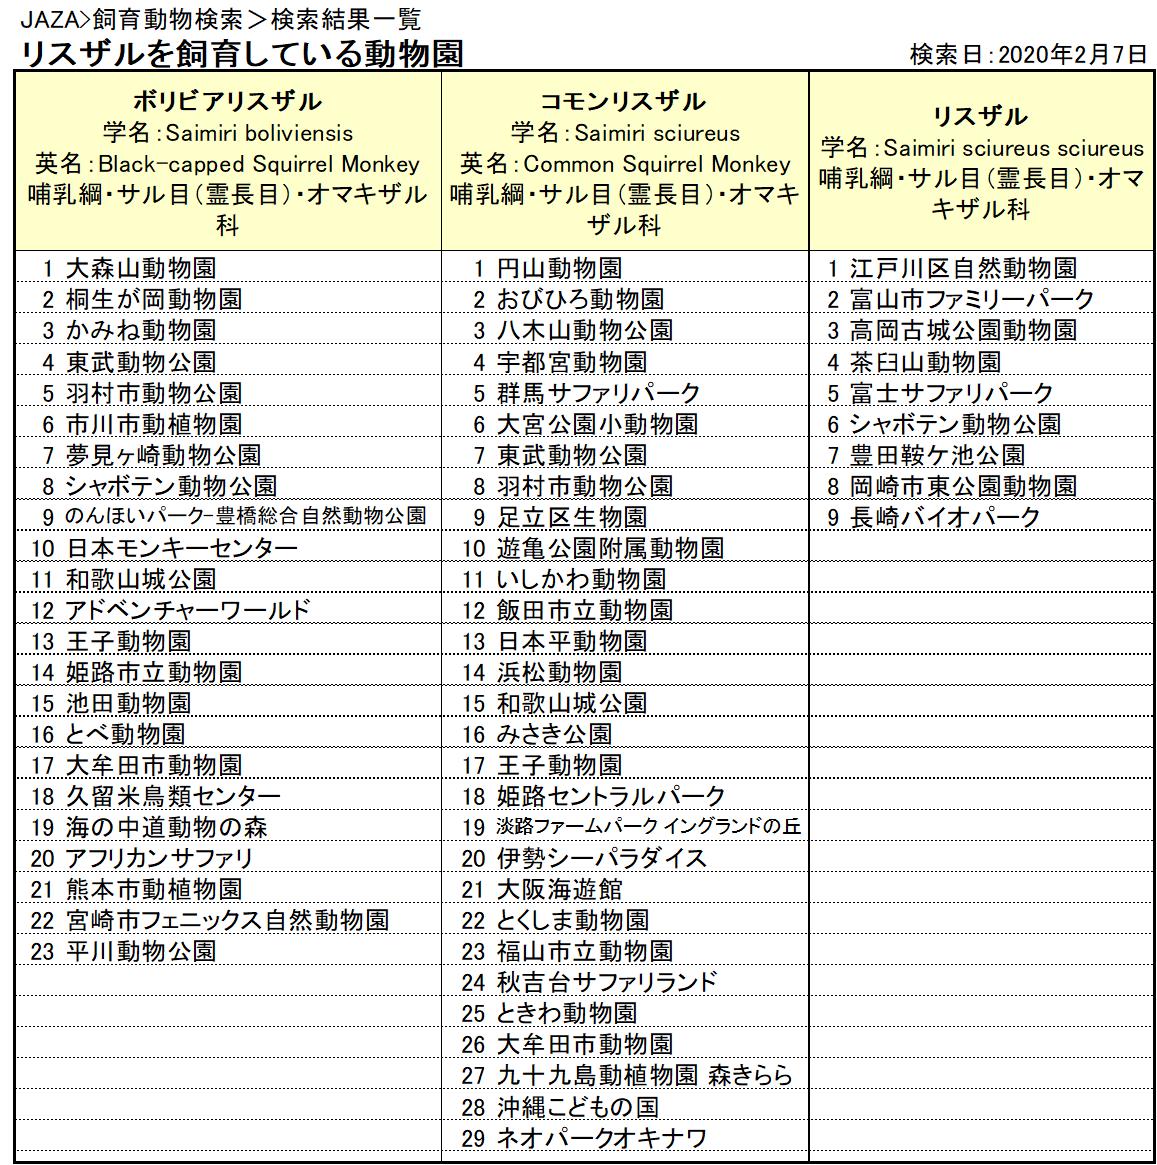 f:id:tsukunepapa:20200207140535p:plain